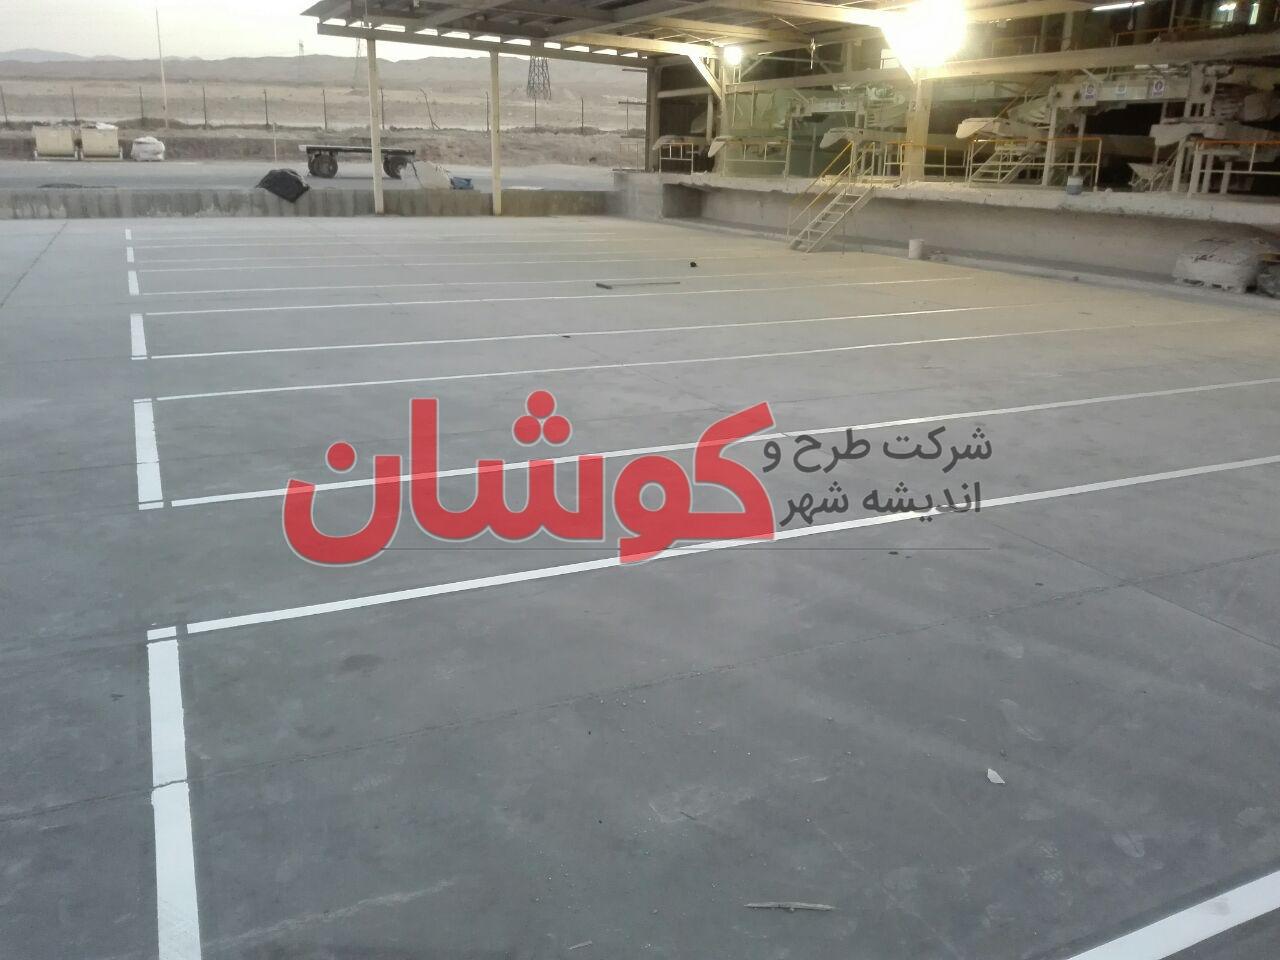 photo 2019 09 21 11 56 23 wm - خط کشی پارکینگ و محوطه کارخانه ایران کناف